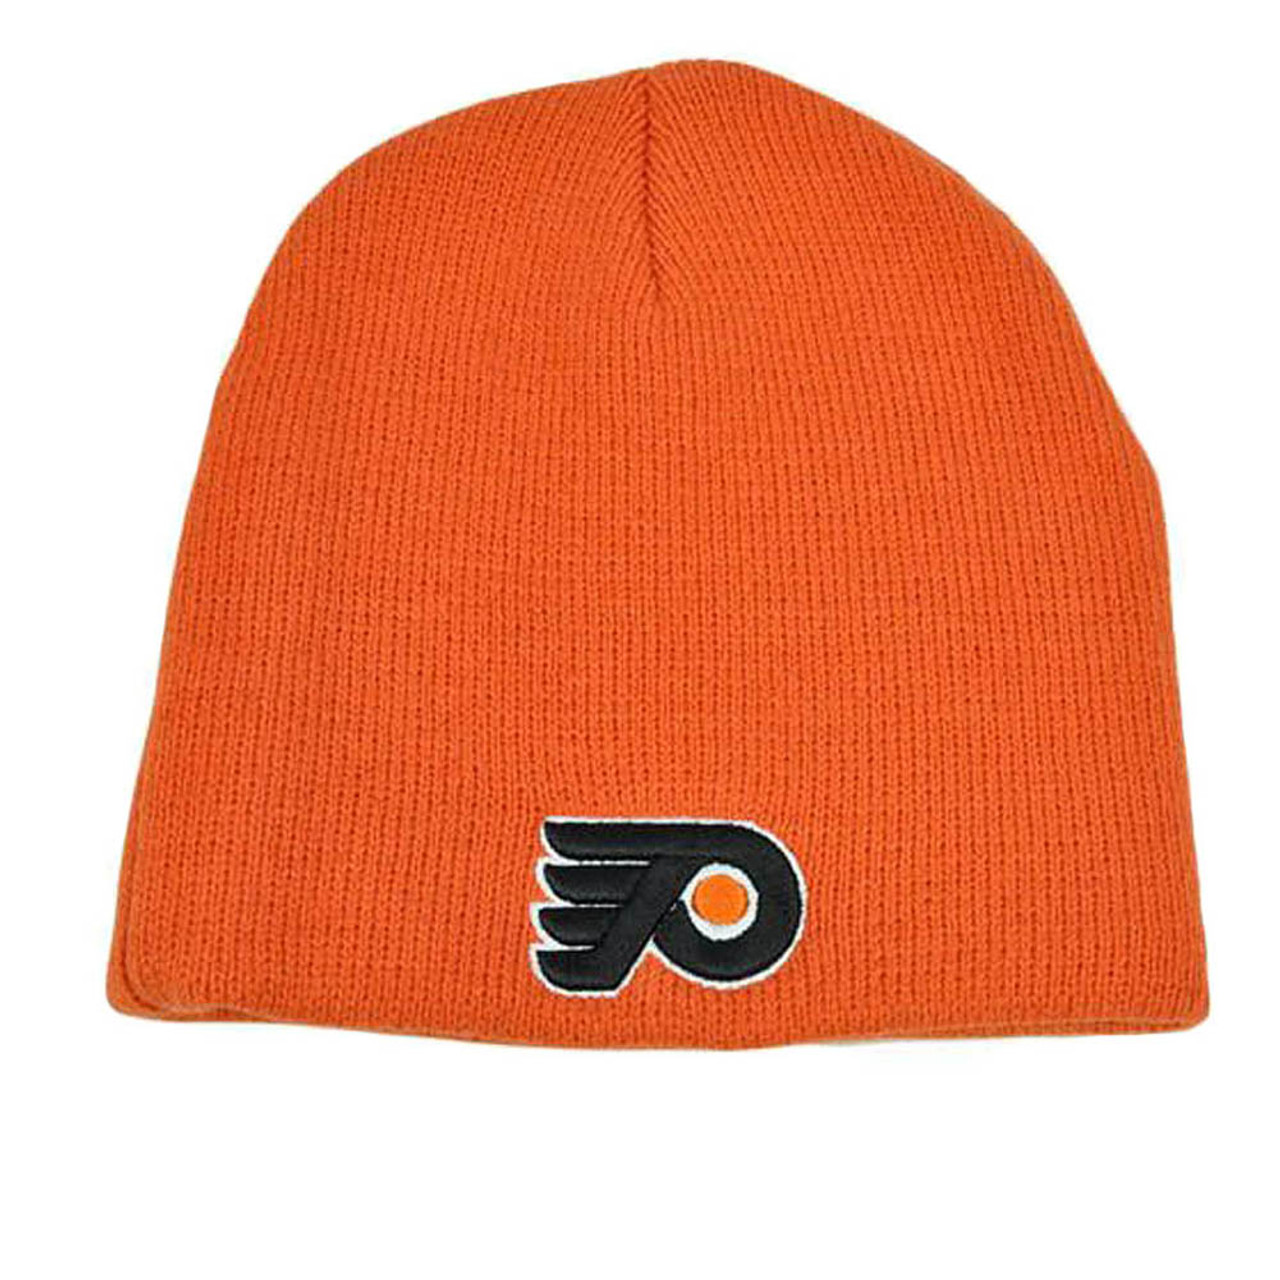 0a6b663a7 NHL LNH Zephyr Thick Orange Knit Toque Nordic Beanie Cap Hat Philadelphia  Flyers